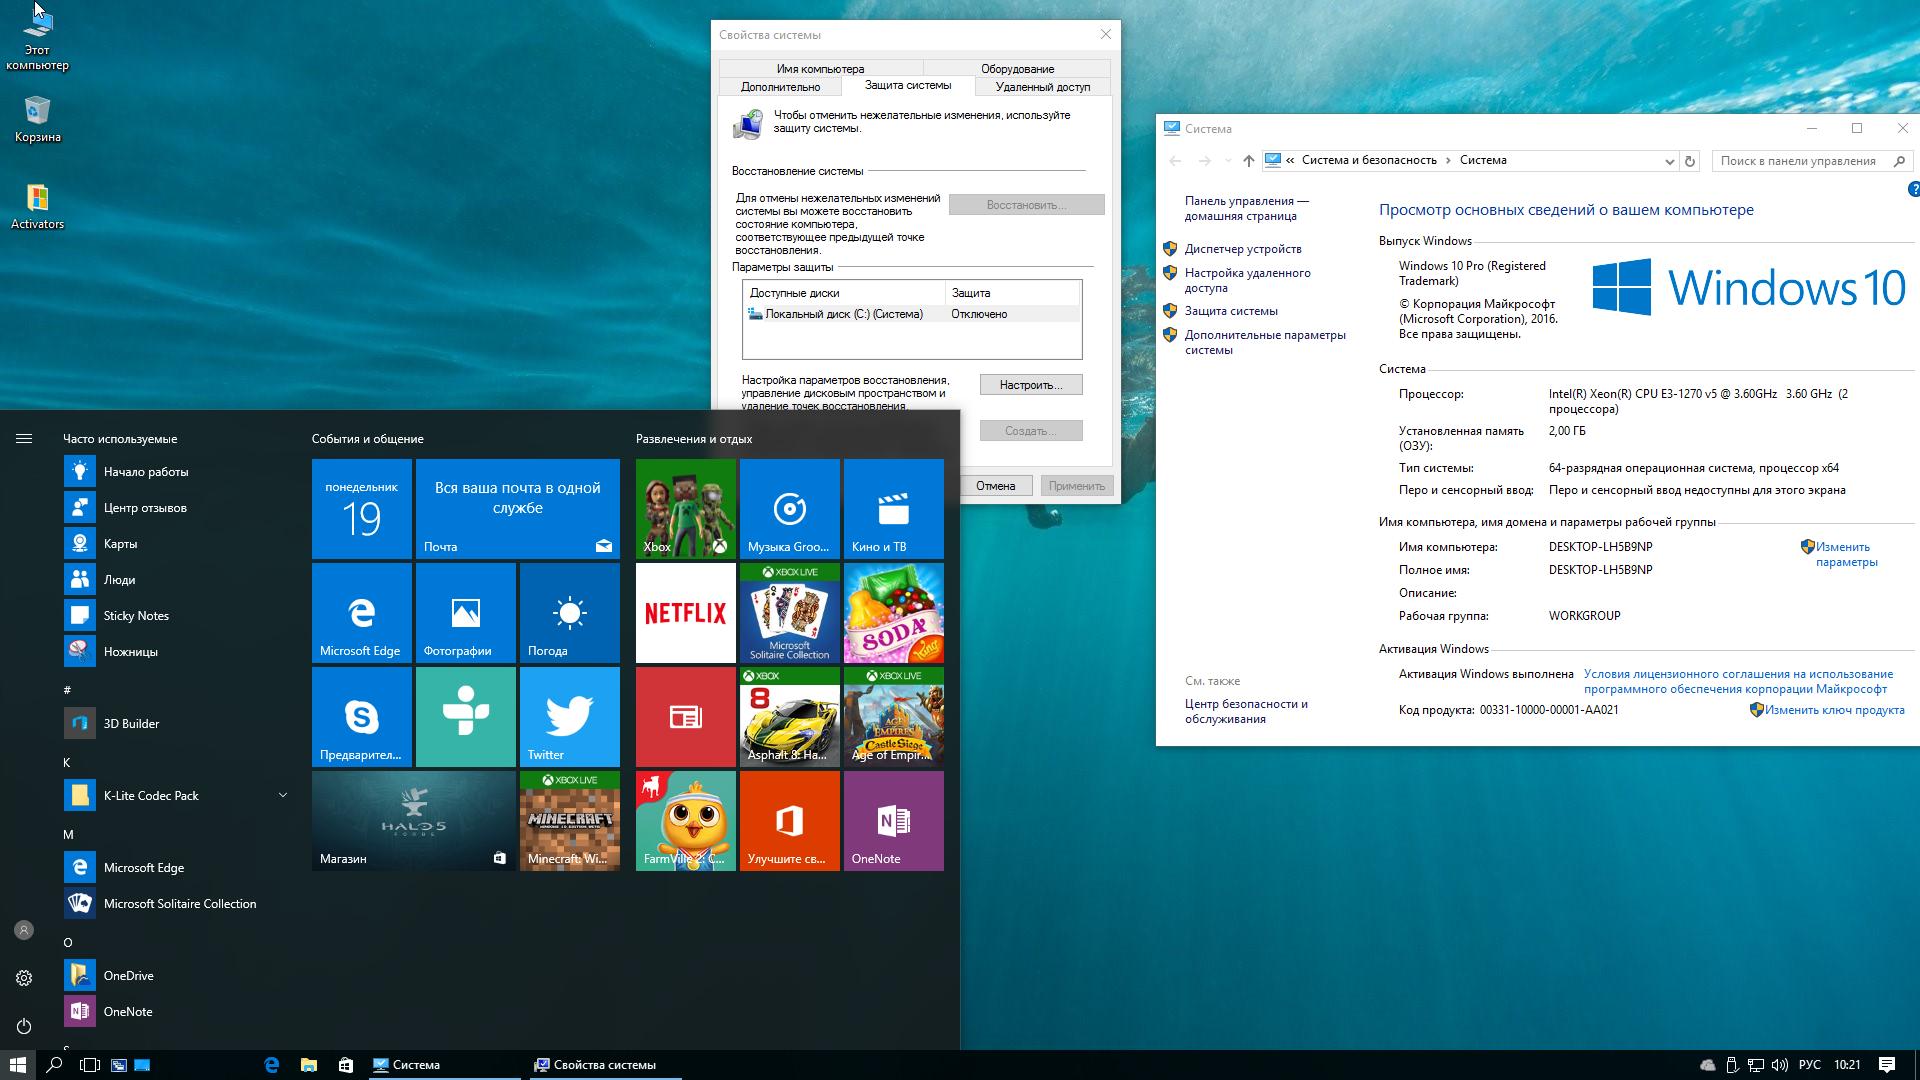 image Microsoft windows version 10014393 c 2016 microsoft corporation todo